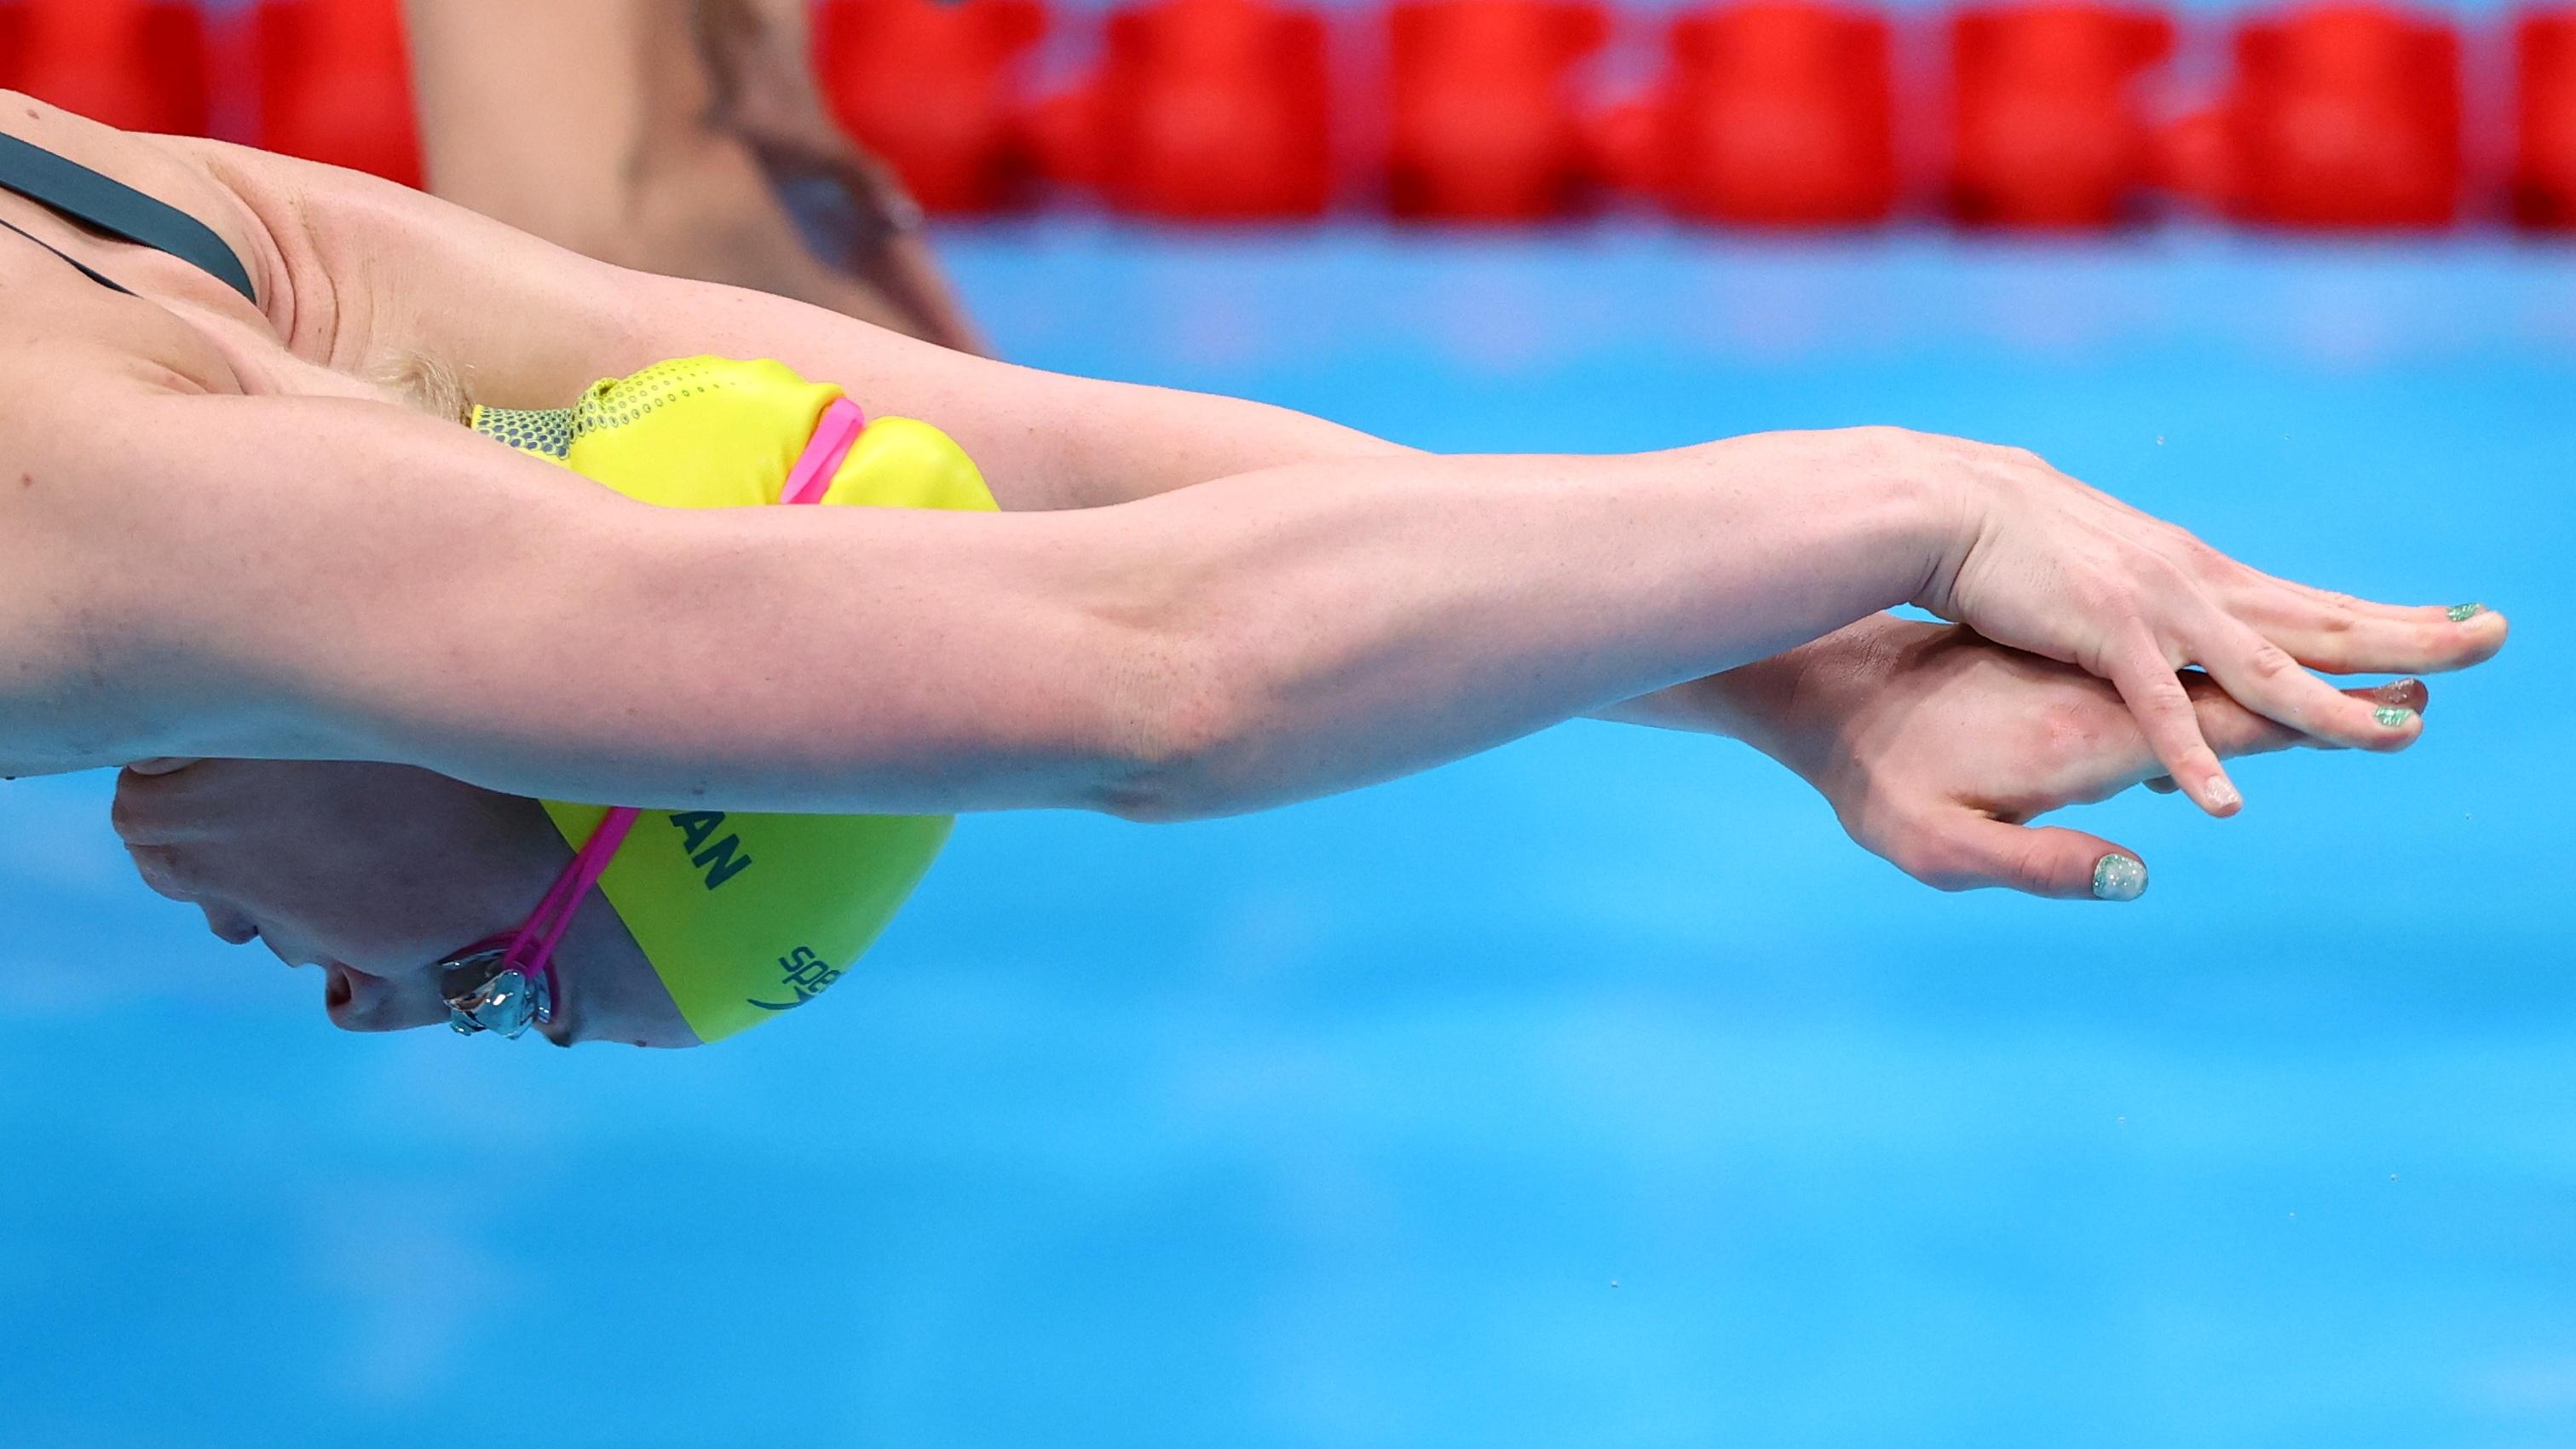 Tokyo 2020 Olympics - Swimming - Women's 4 x 100m Freestyle Relay - Heats - Tokyo Aquatics Centre - Tokyo, Japan - July 24, 2021. Mollie O'Callaghan of Australia in action REUTERS/Marko Djurica